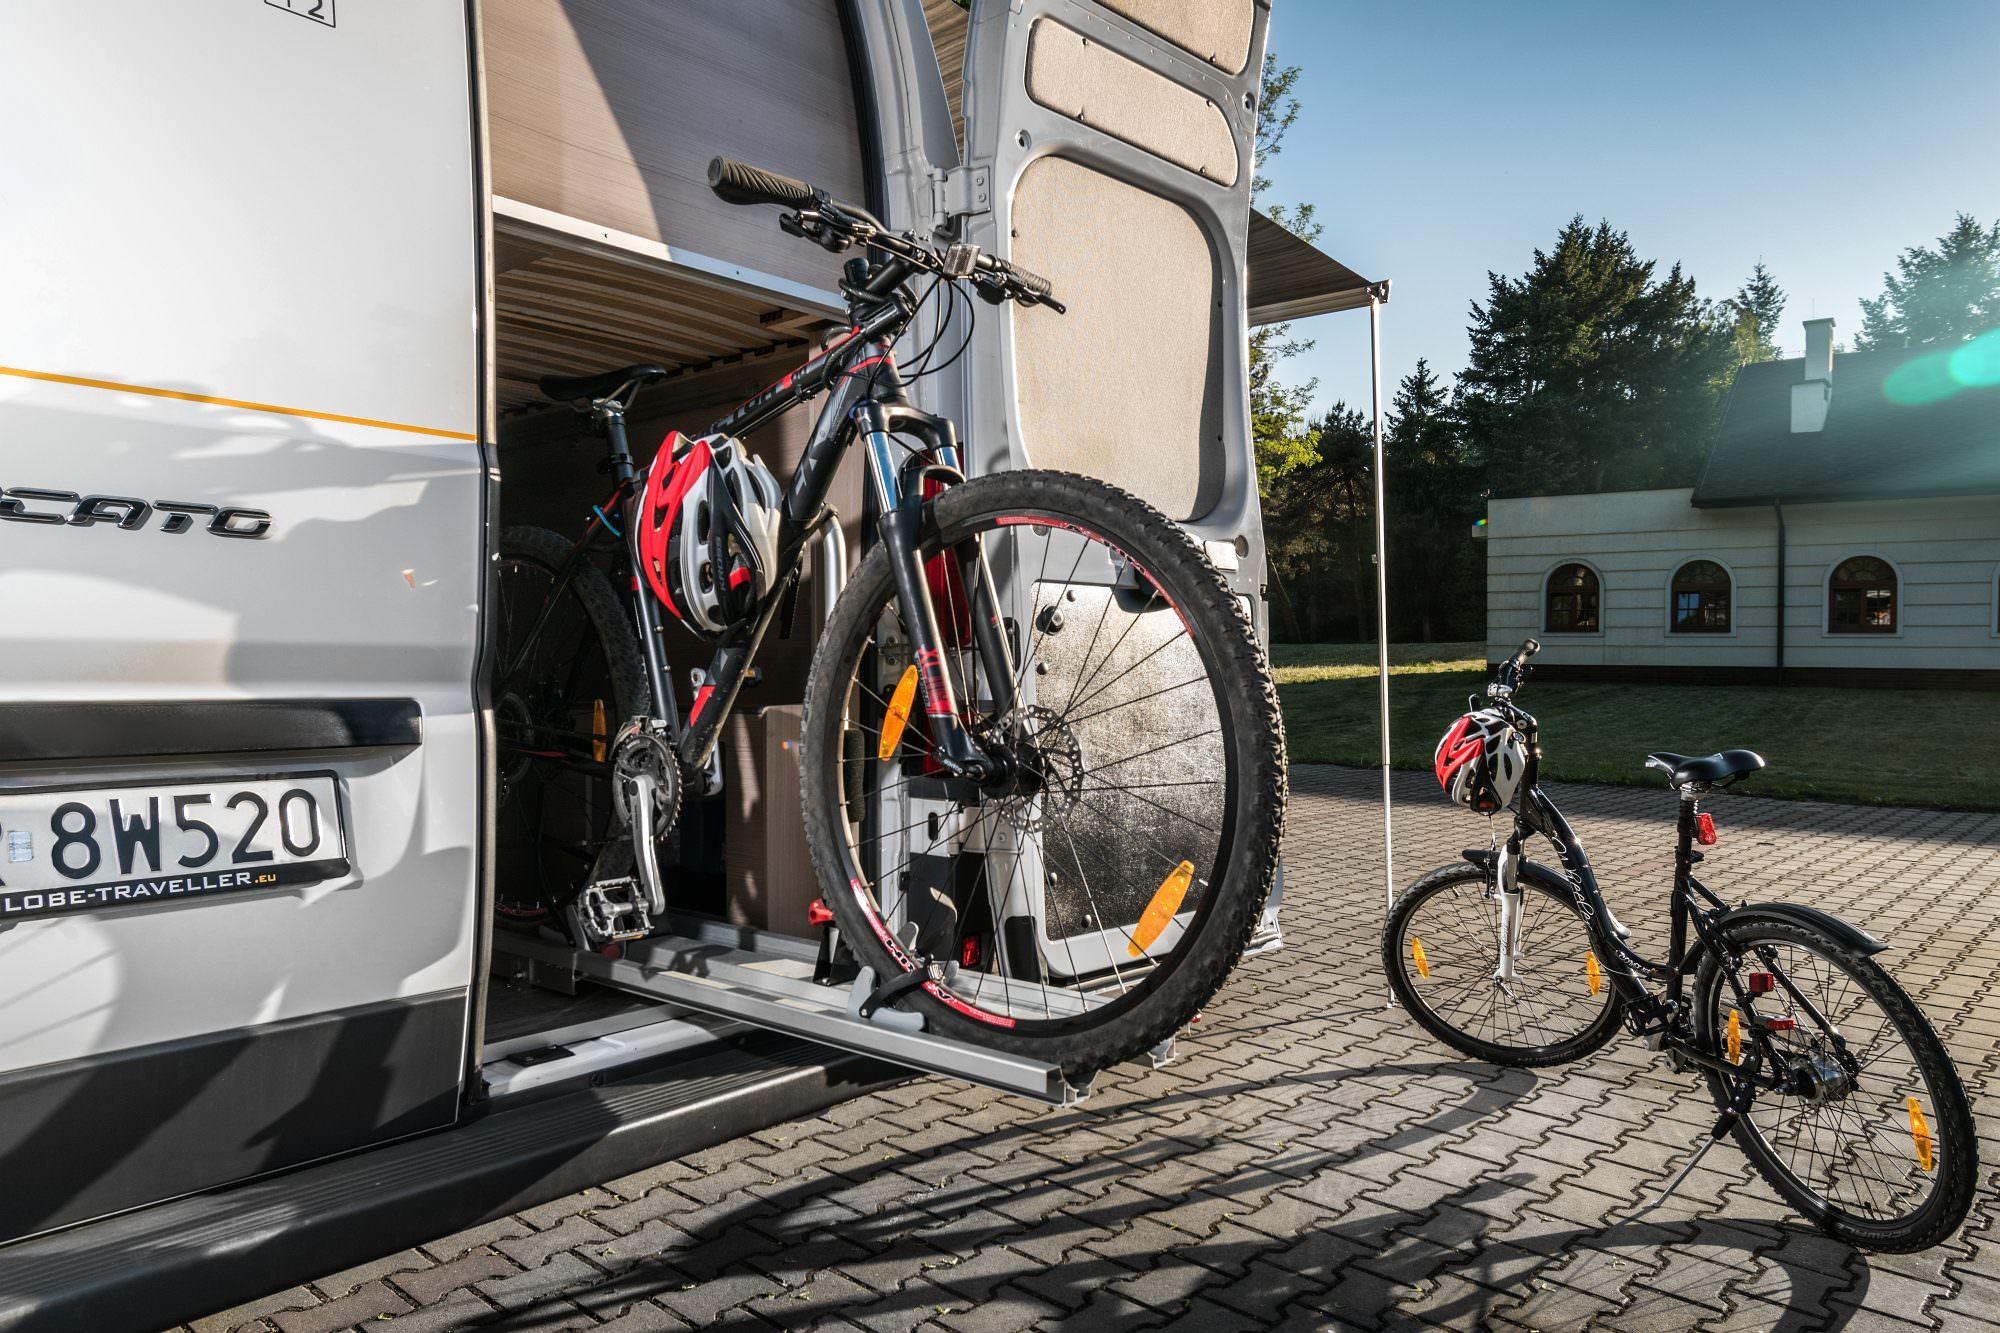 T3S-GlobeTraveller-rowerowy-PZ-9850-2k